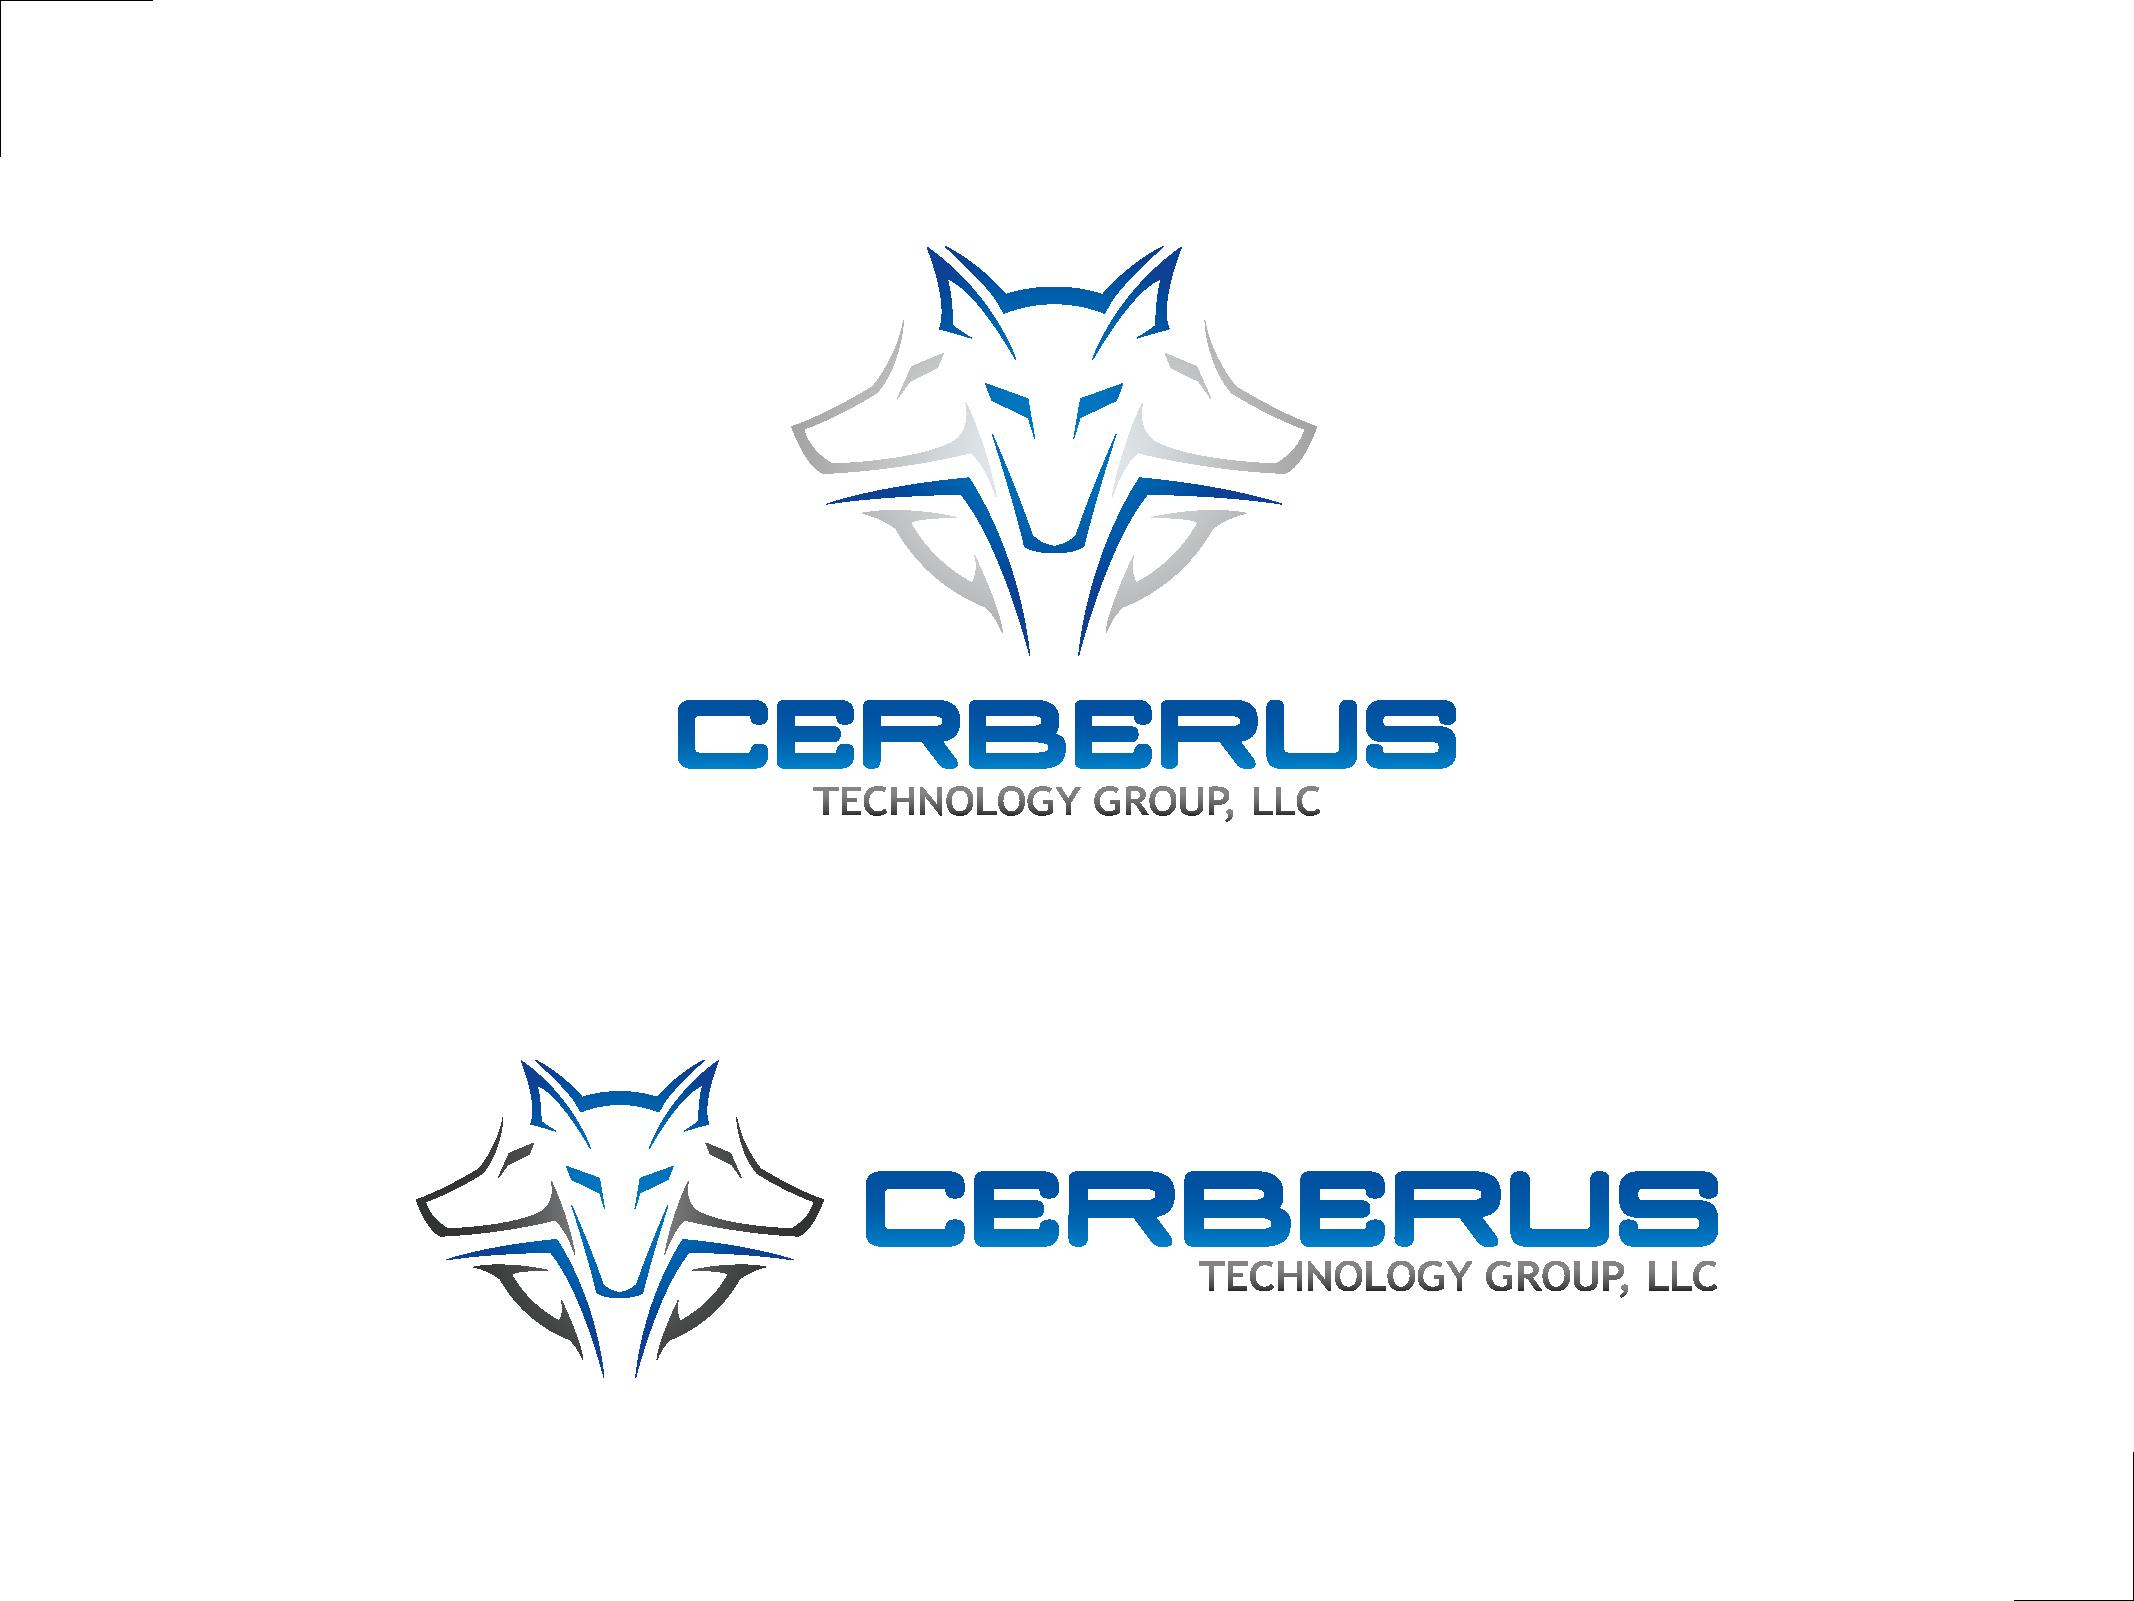 Help Cerberus Technology Group with a sleek edgy logo